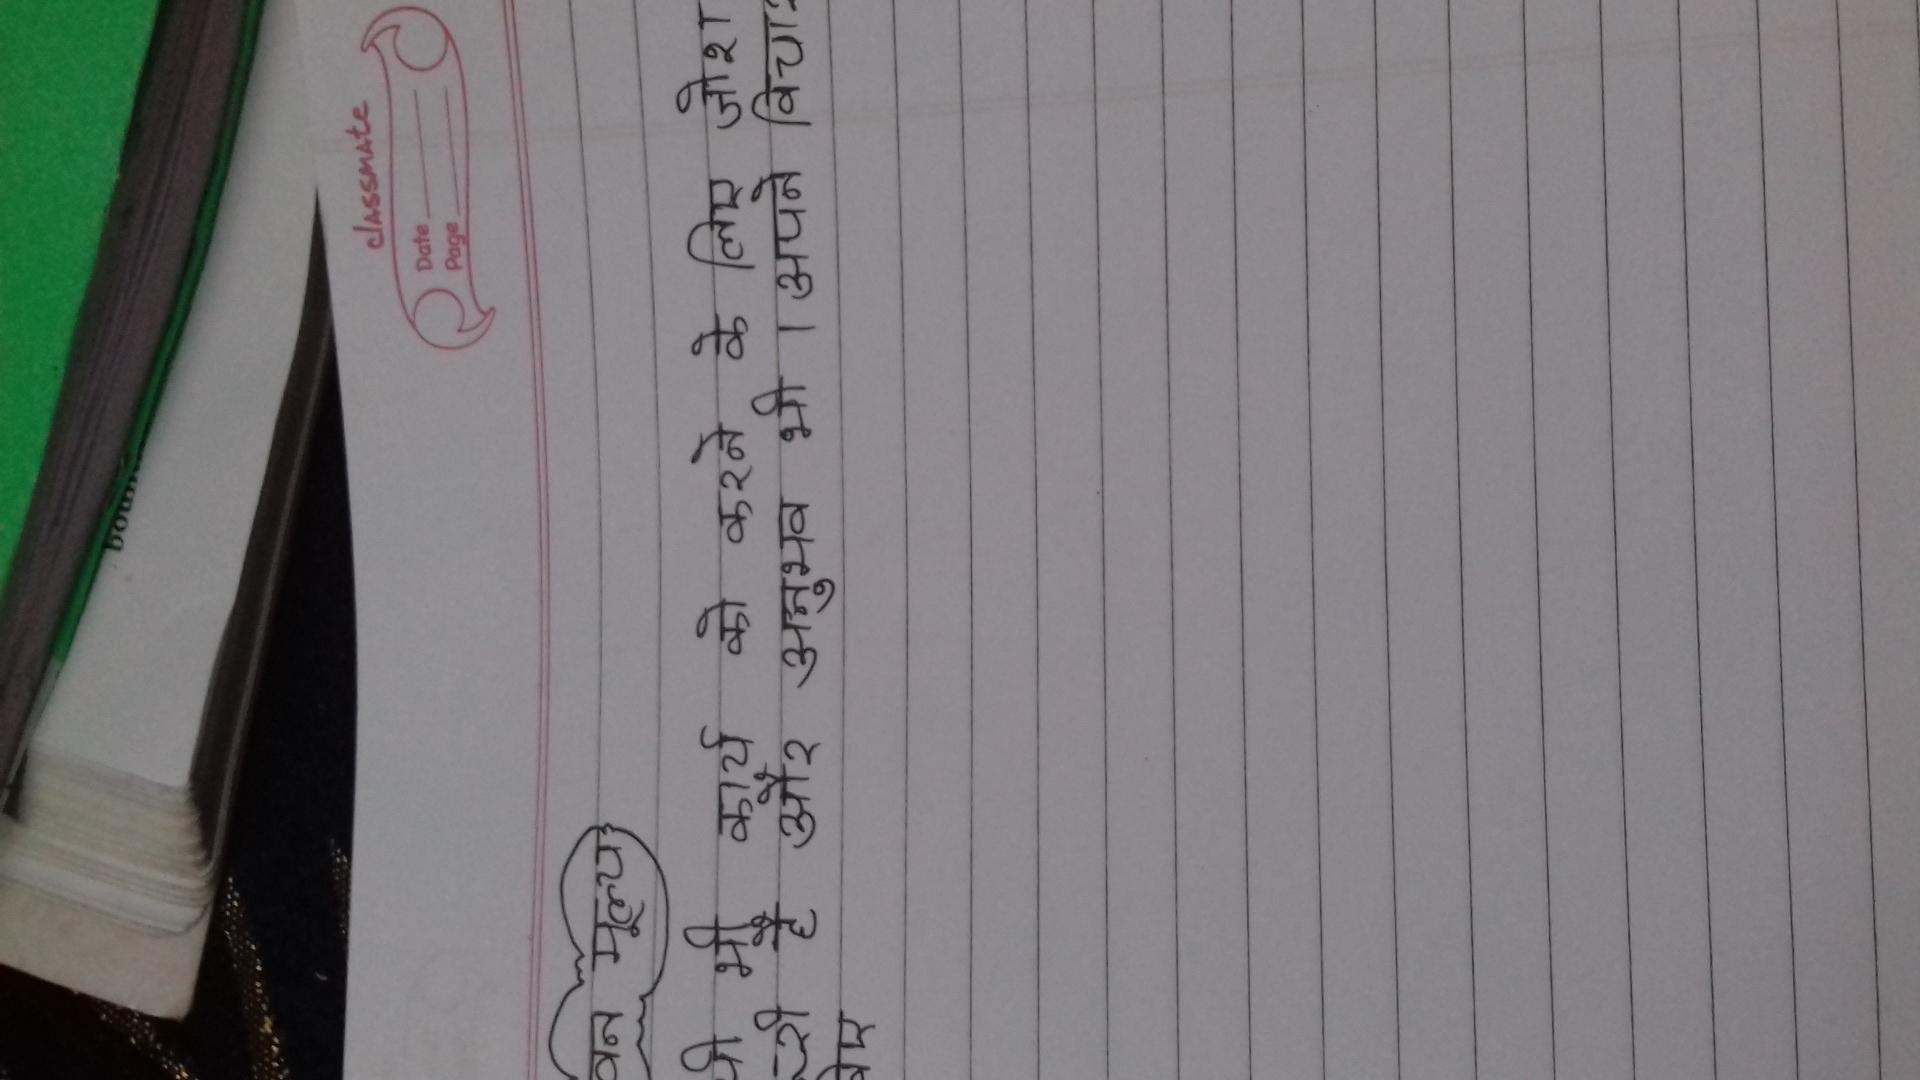 "yadi mein shiksha mantri hota Hindi essay on ""yadi mein pradhan mantri hota"" , "" यदि मैं प्रधानमंत्री होता"" complete hindi essay for class 10."